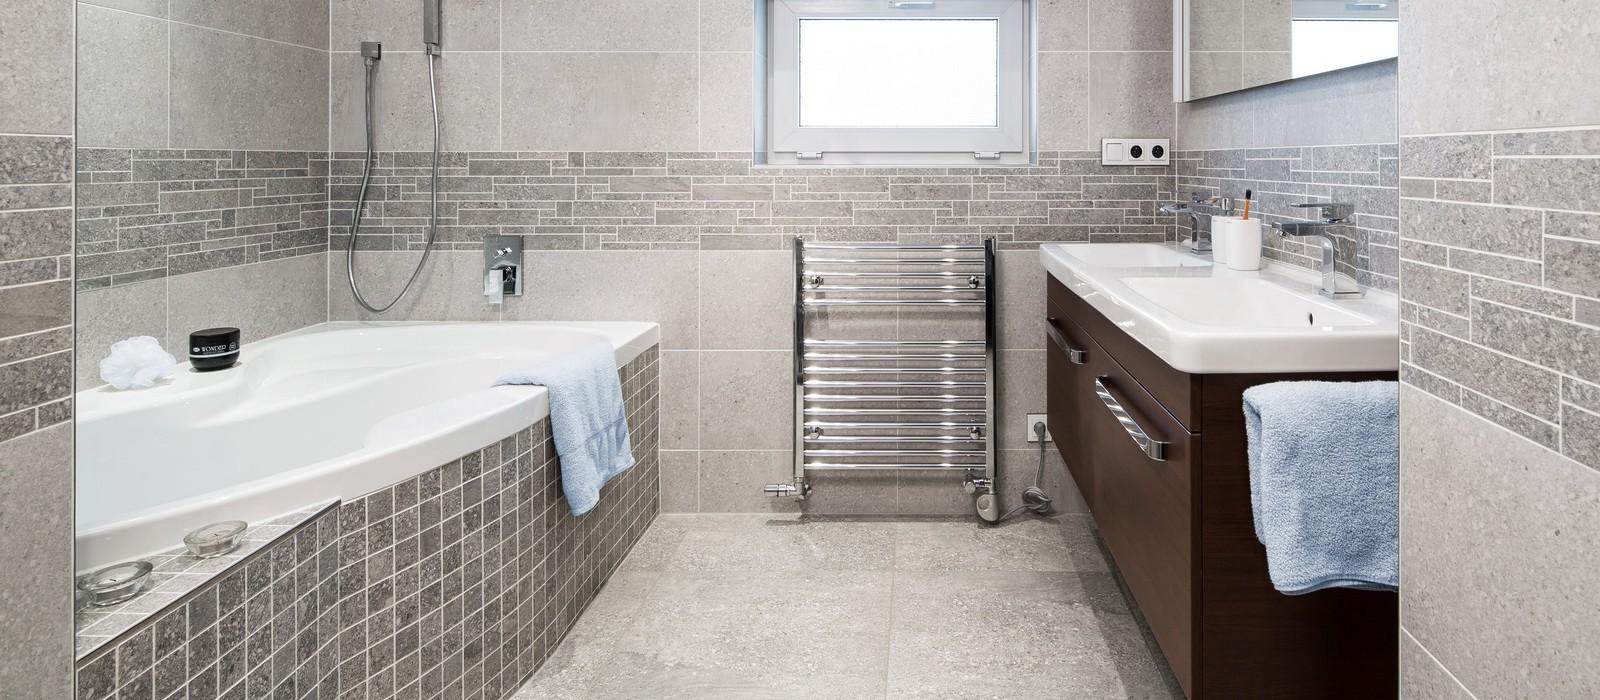 Bathroom - Stones serie - RAKO